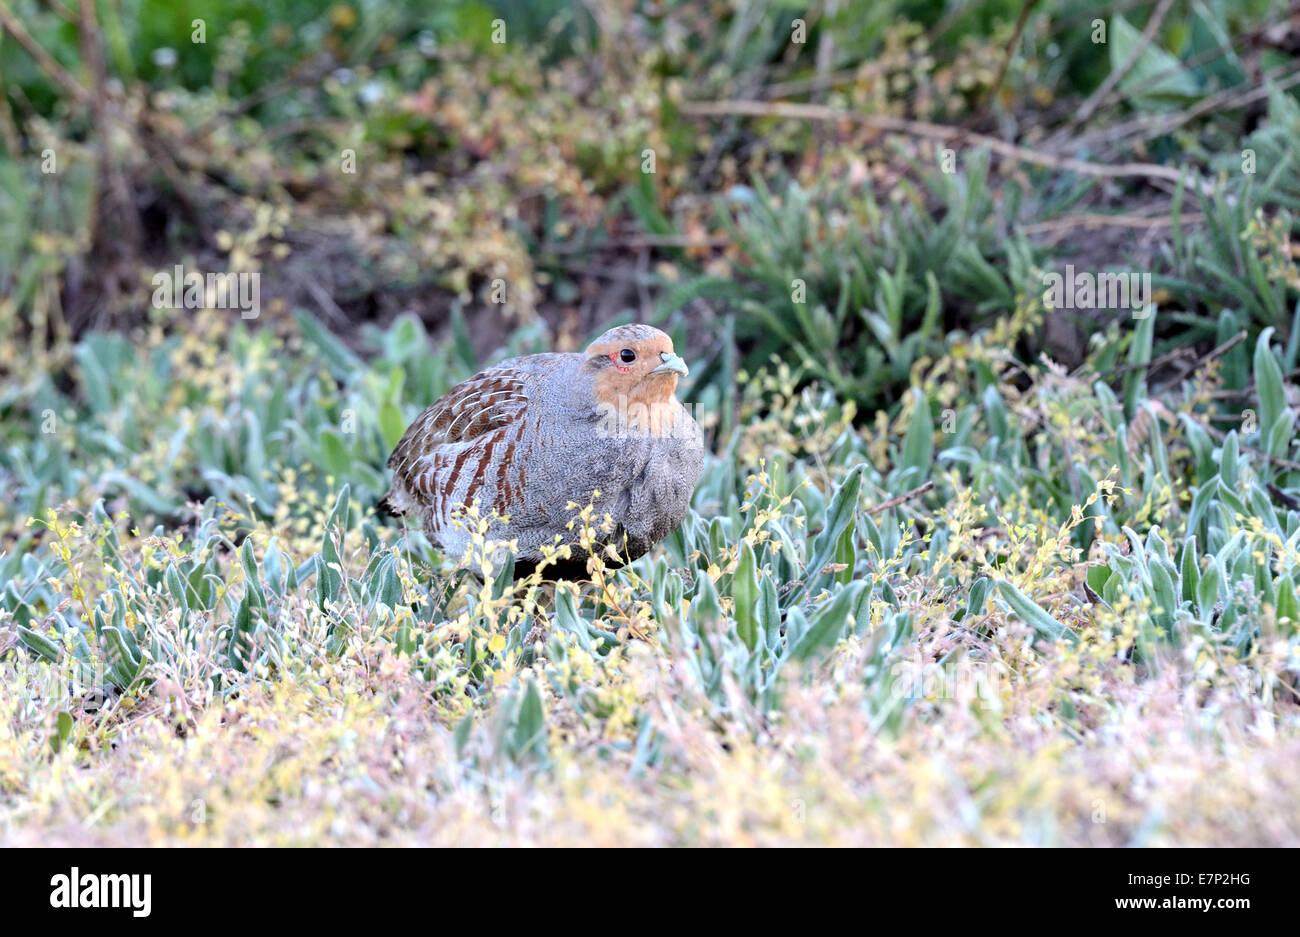 Partridge, Perdix perdix, chickens, hens, gallinaceous bird, wild chickens, bird, Galliformes, partridges, bird, - Stock Image